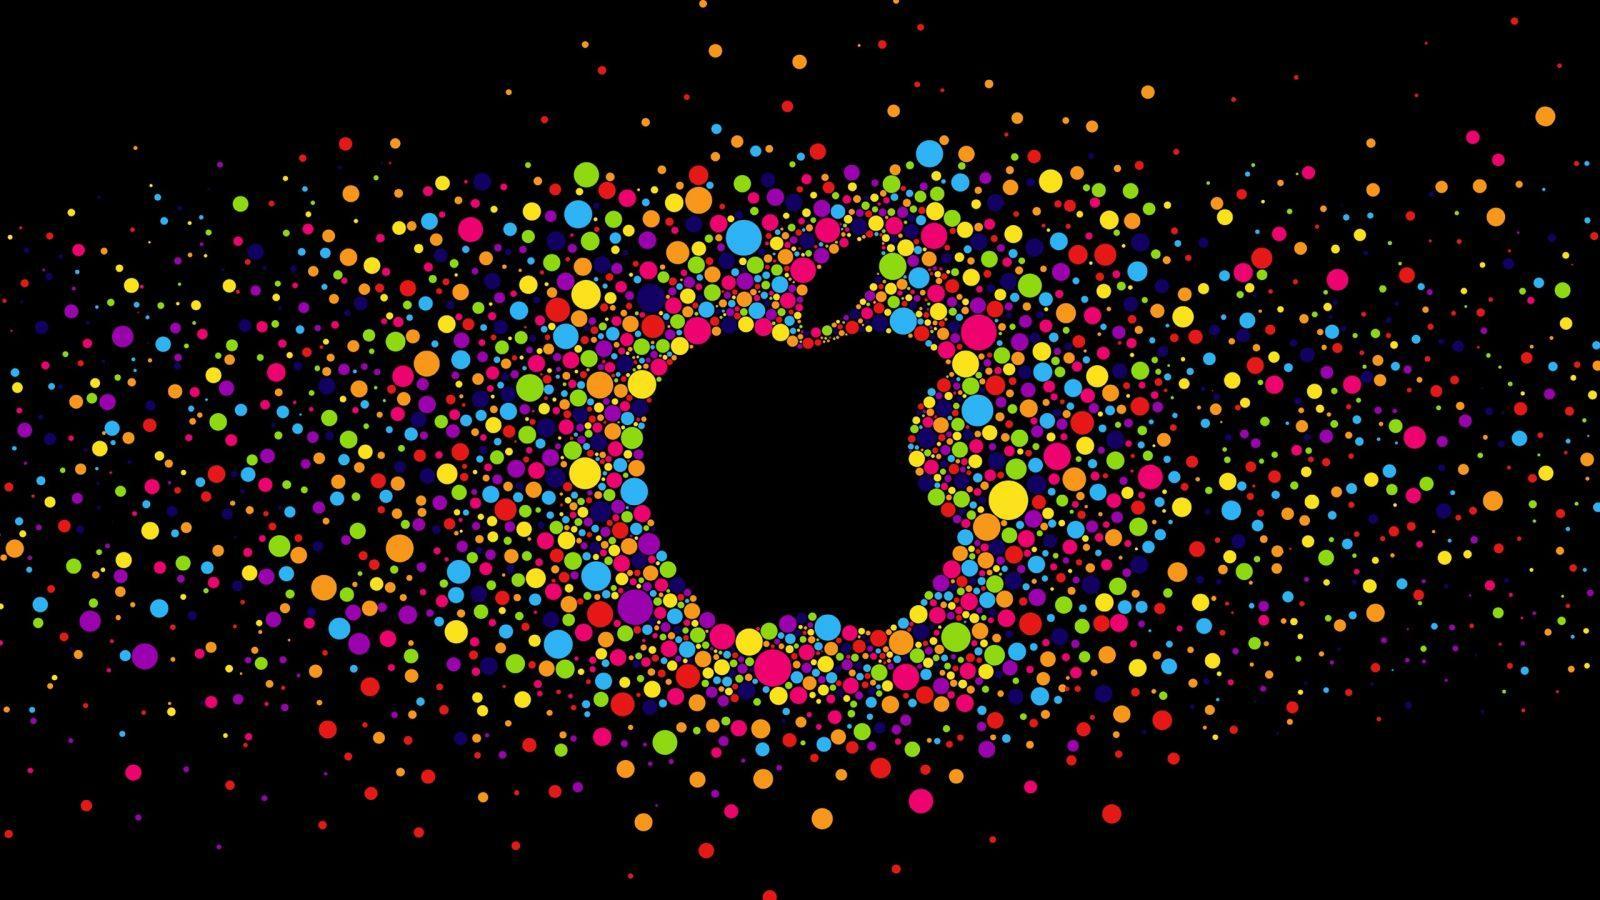 Apple запатентовала клавиатуру с дисплеем в каждой клавише